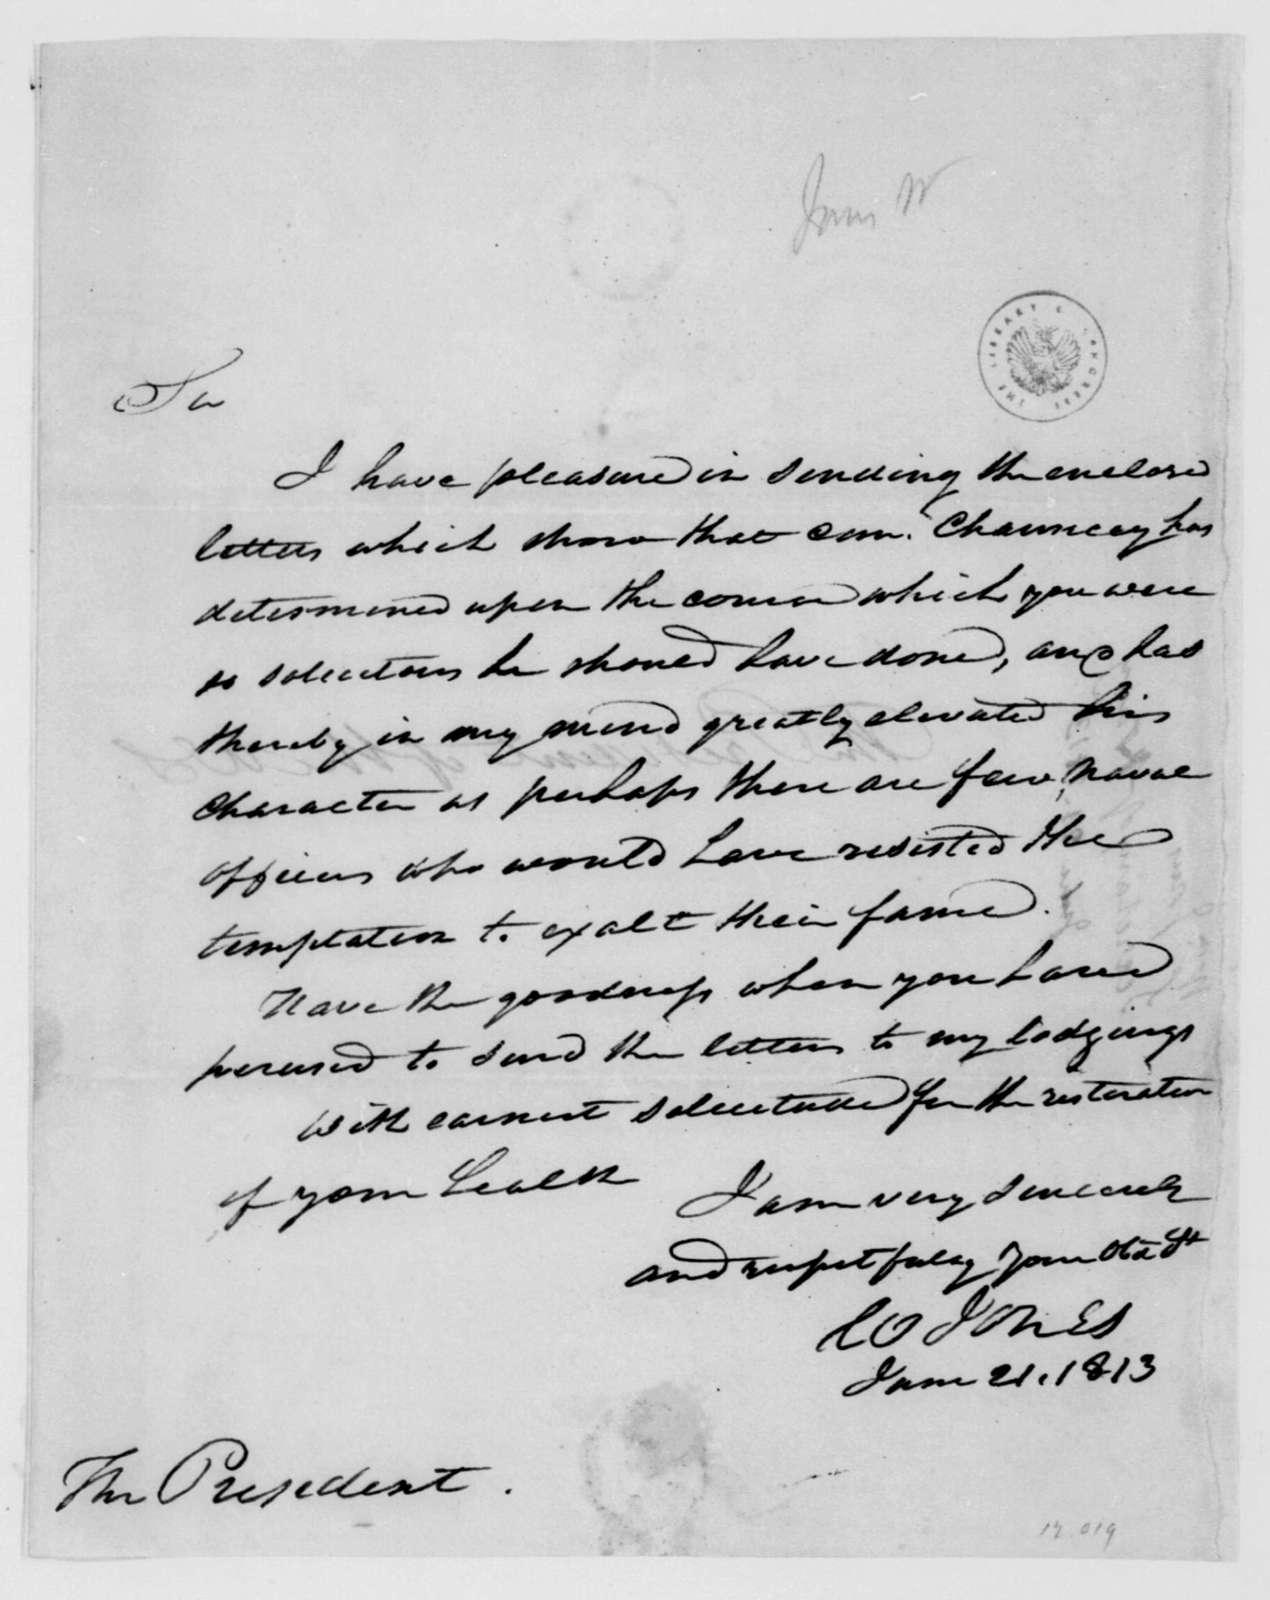 William Jones to James Madison, June 21, 1813.